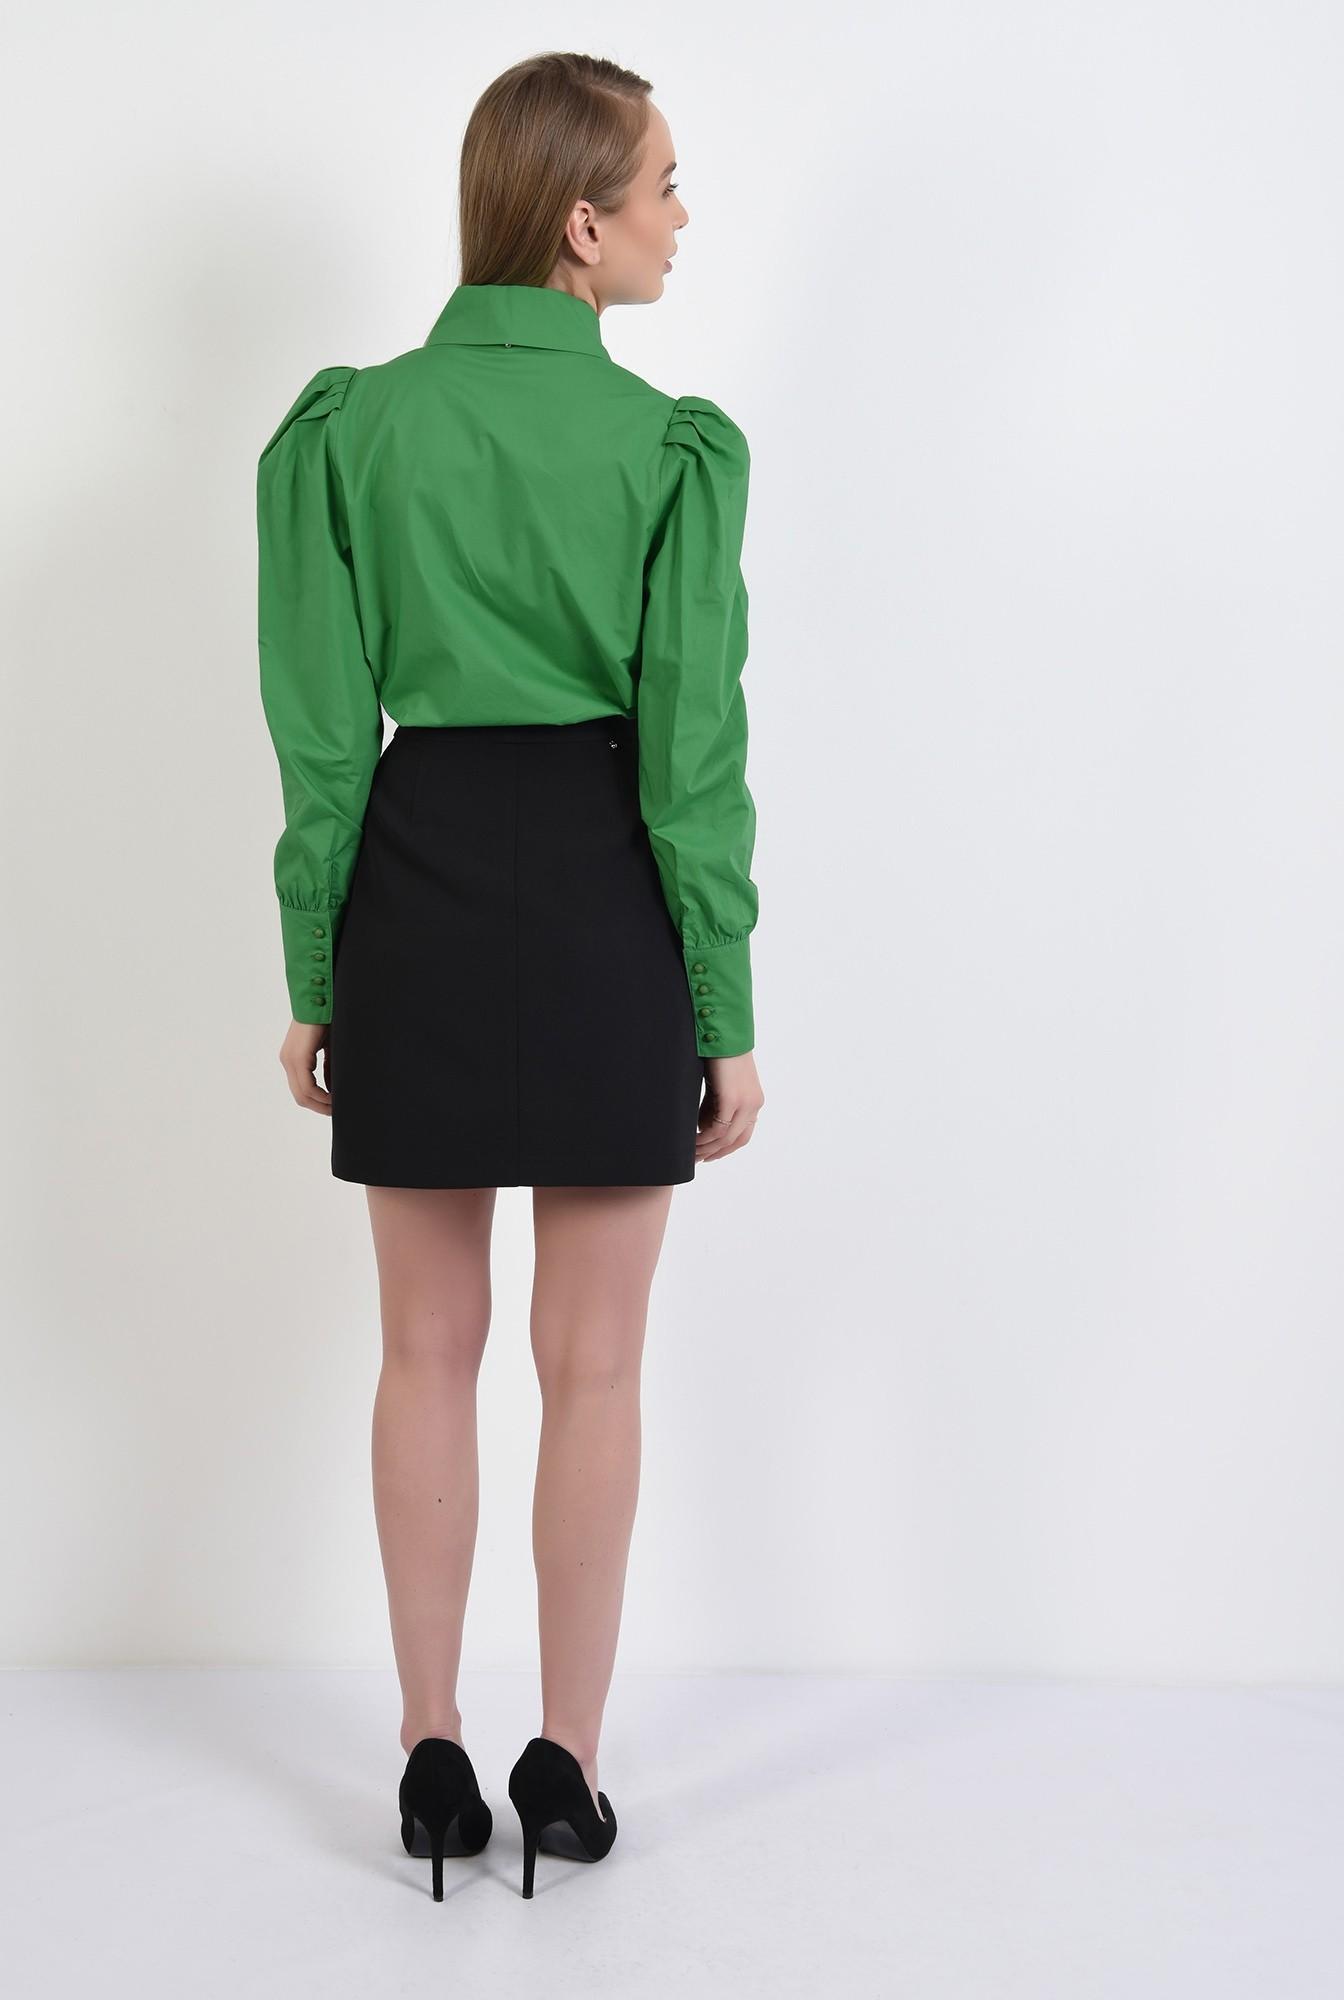 1 -  fusta mini, neagra, dreapta, cu talie inalta, fermoar in fata